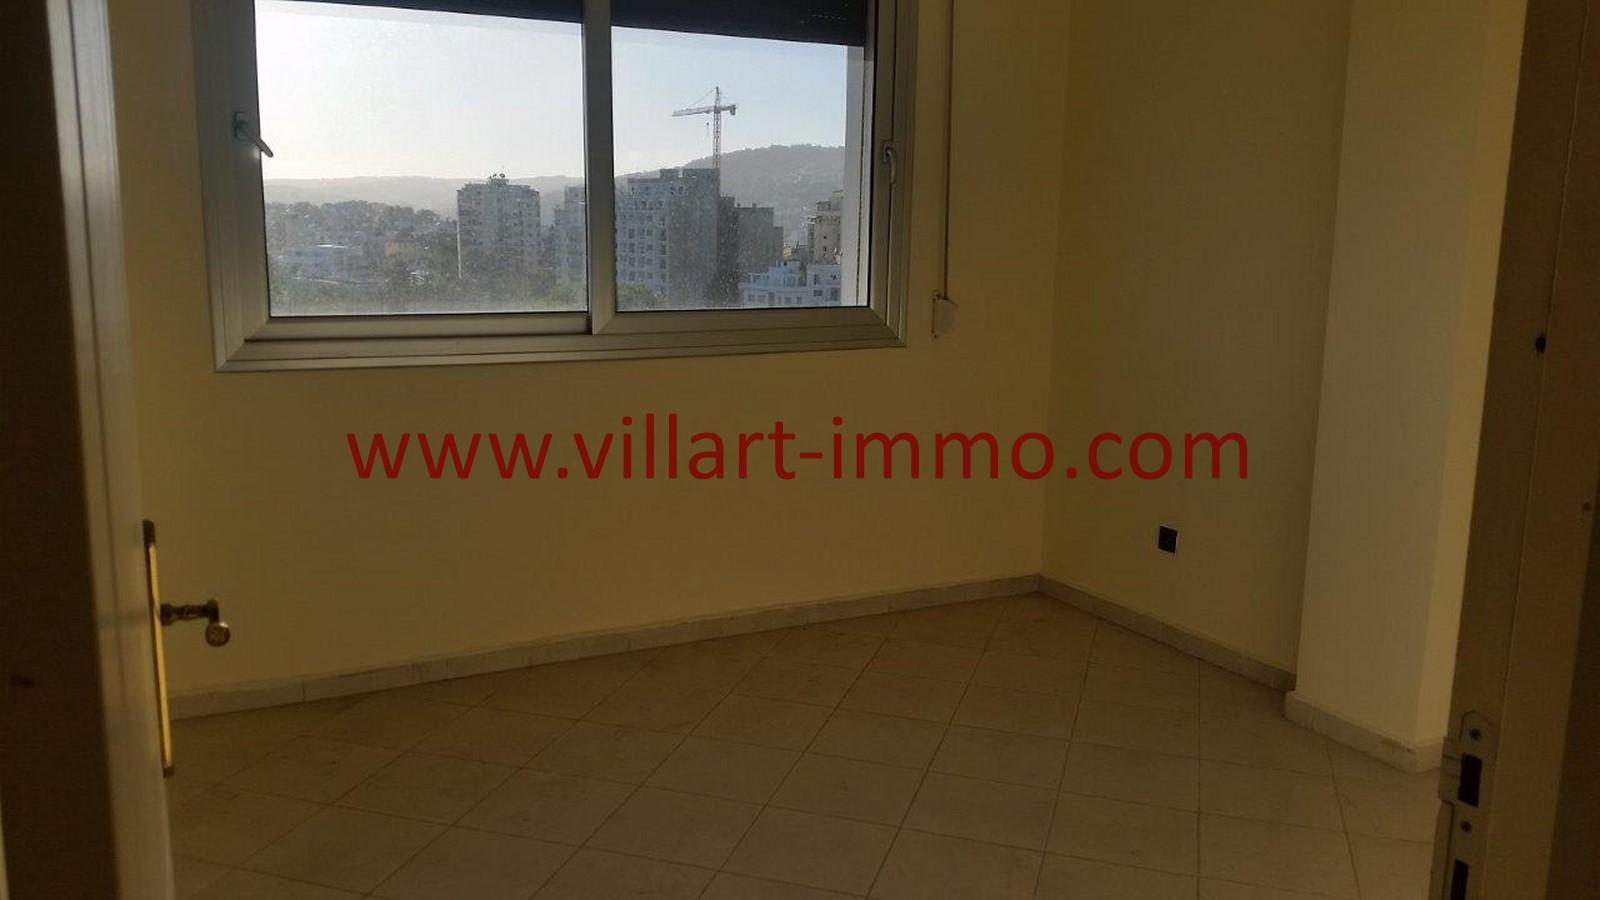 8-location-appartement-meubles-tanger-iberia-chambre-3-l1012-villart-immo-marocmaroc